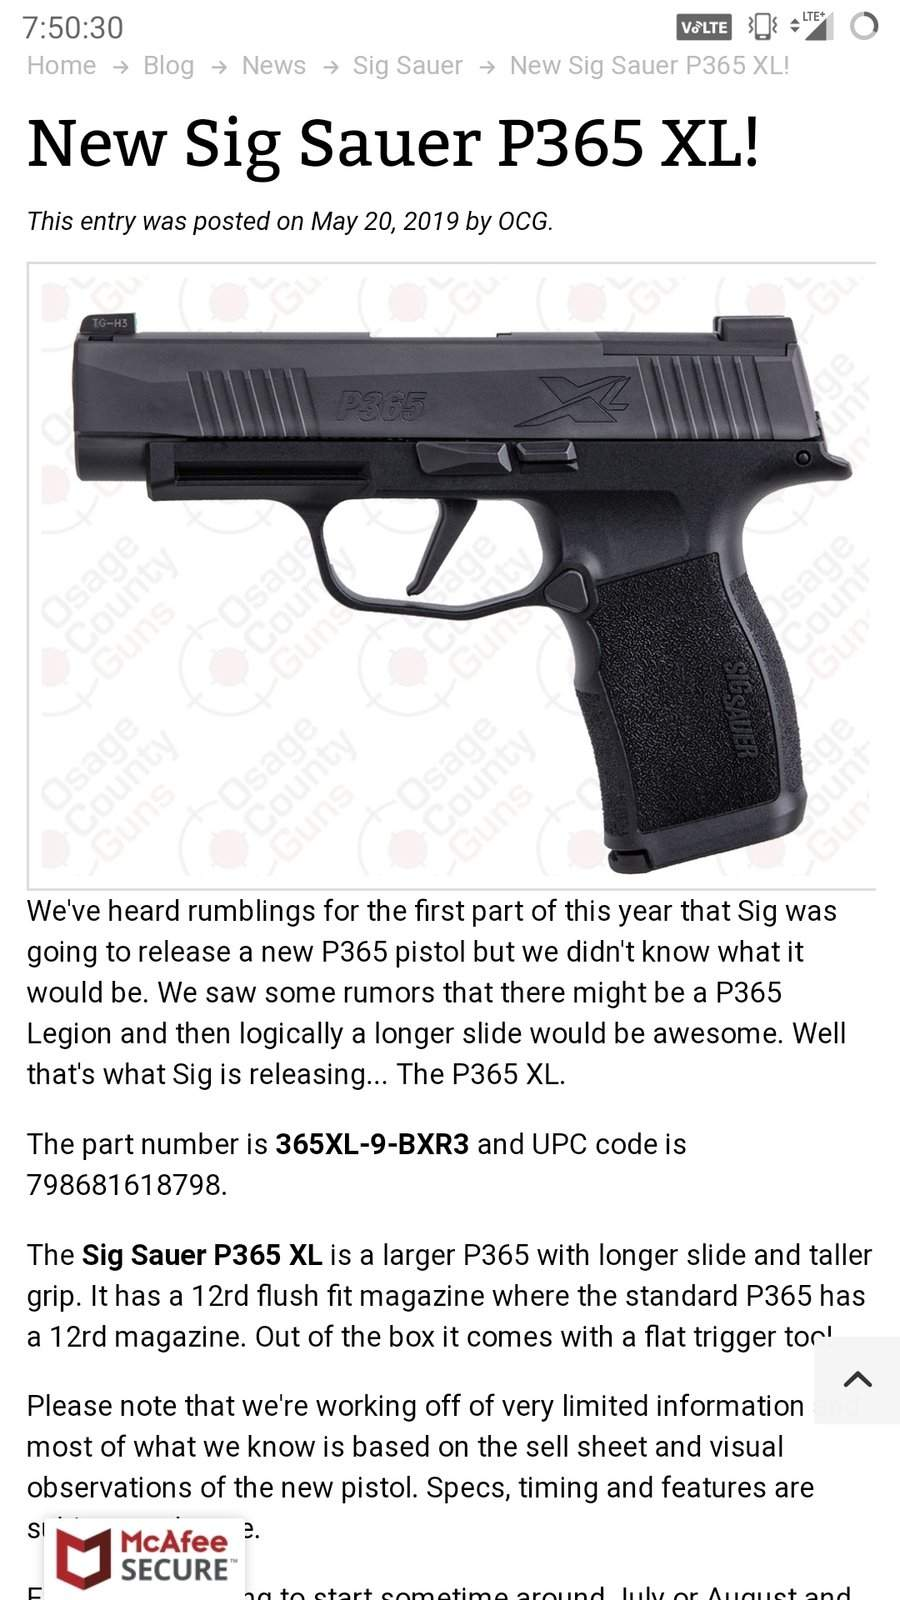 Sigp365xl? | Northwest Firearms - Oregon, Washington, and